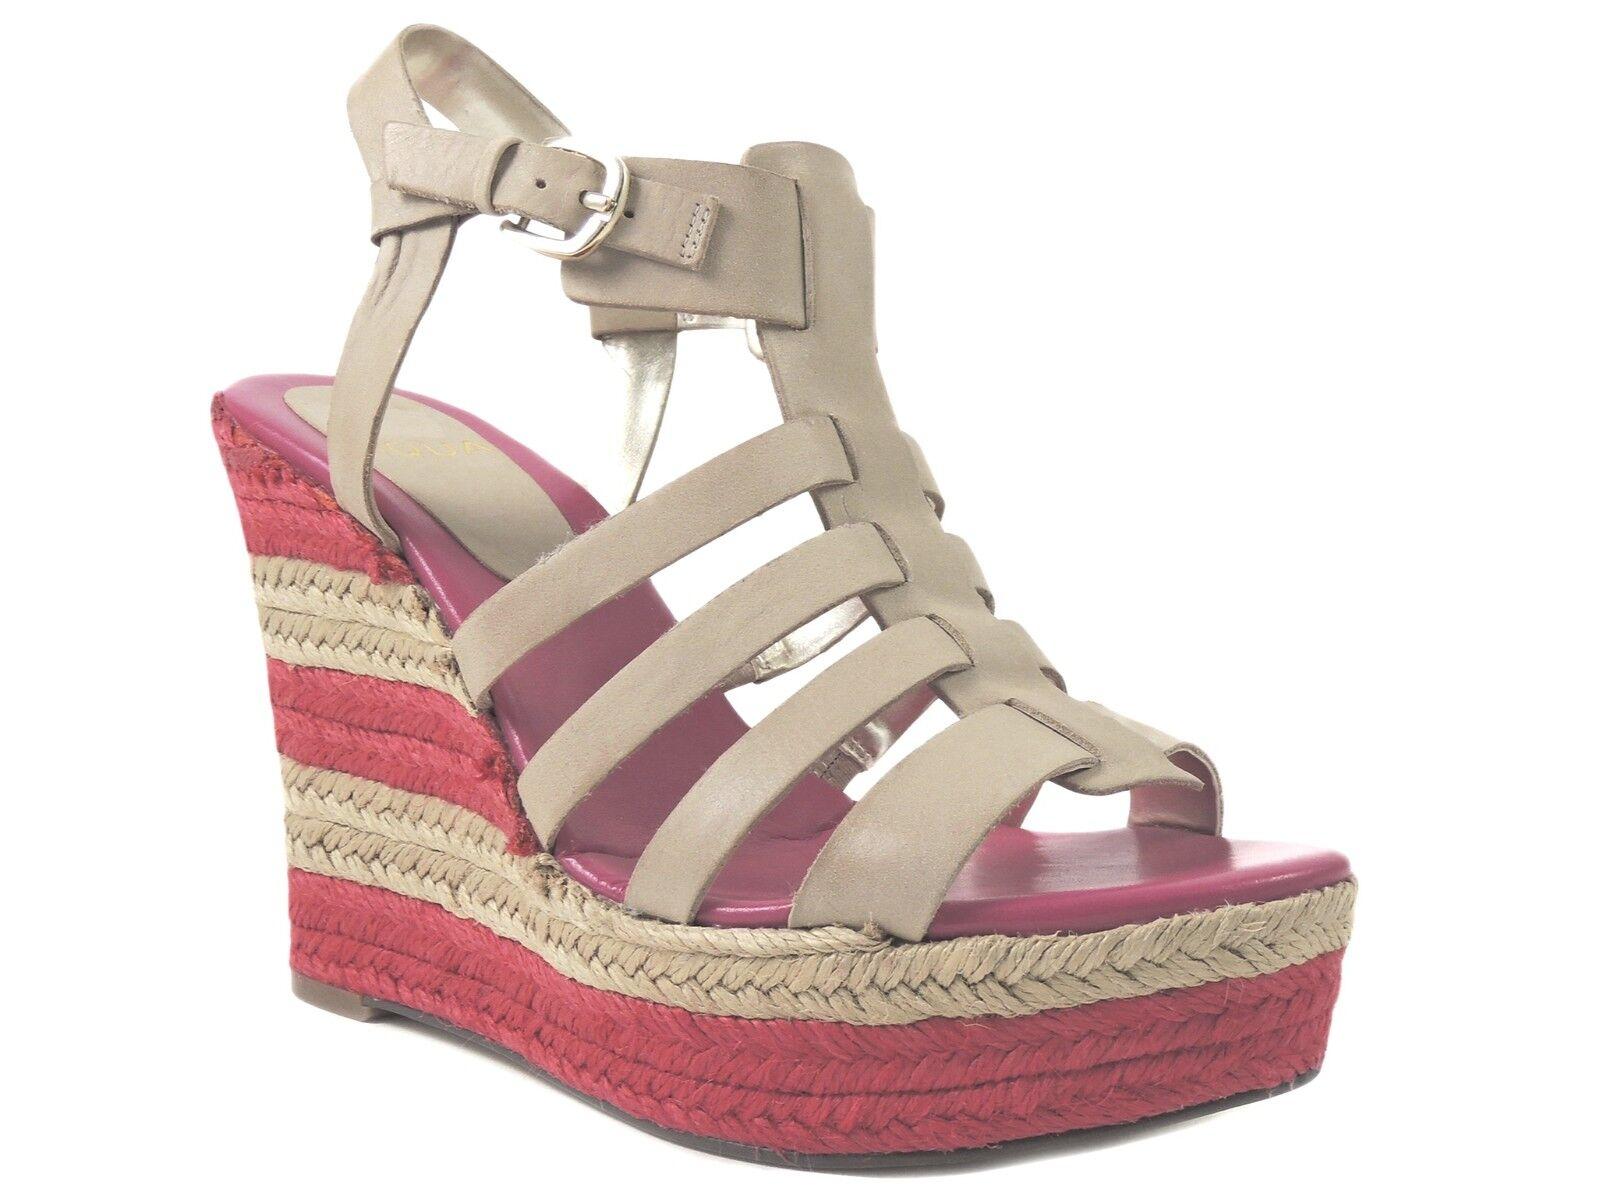 Aqua Women's Dehli Caged Espadrille Sandals Natural Pink Leather Size 9 M